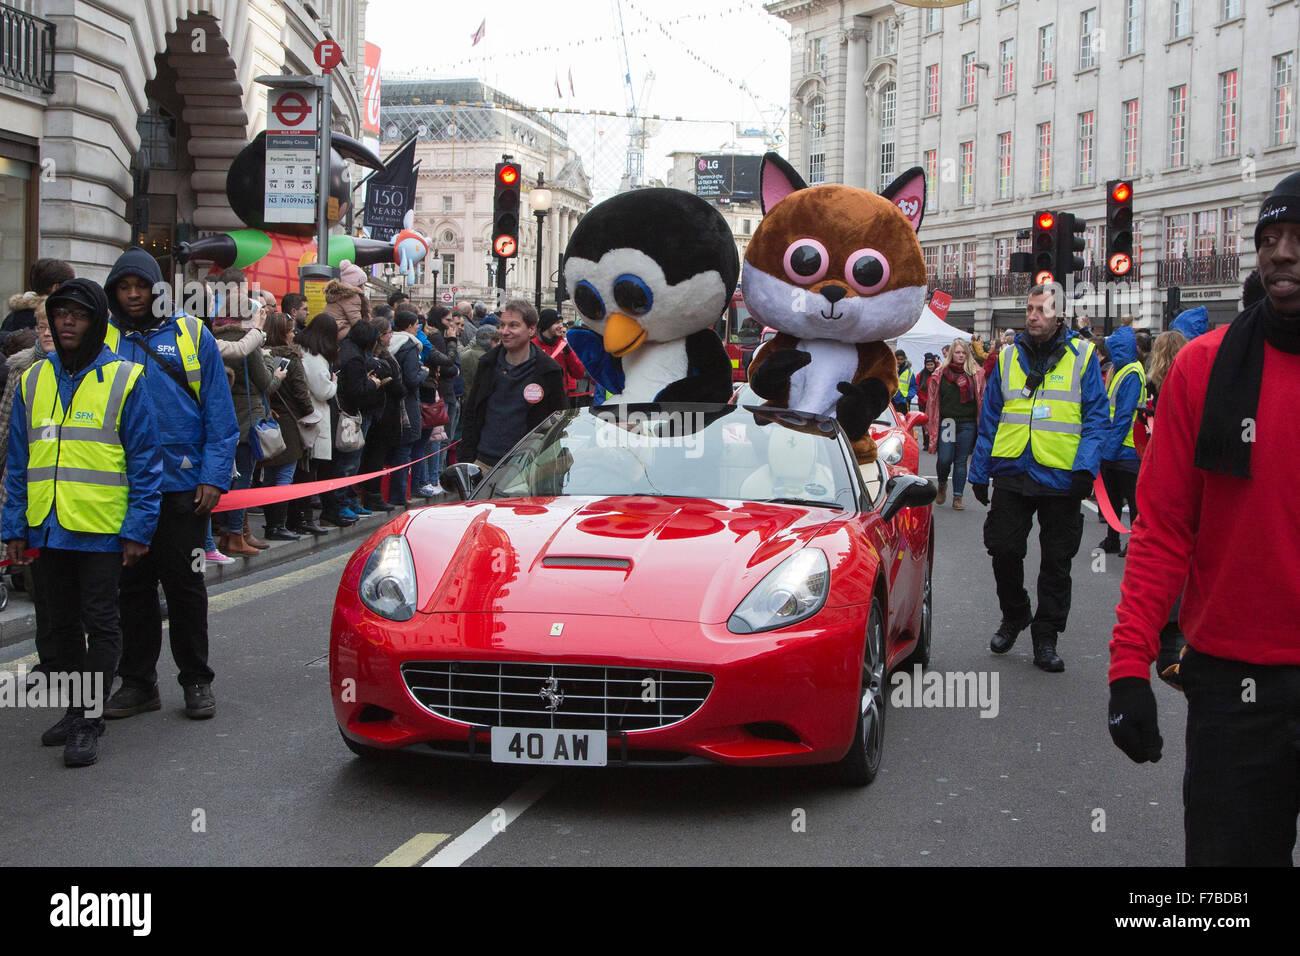 London UK 28 November 2015 Beanie Boos characters on parade